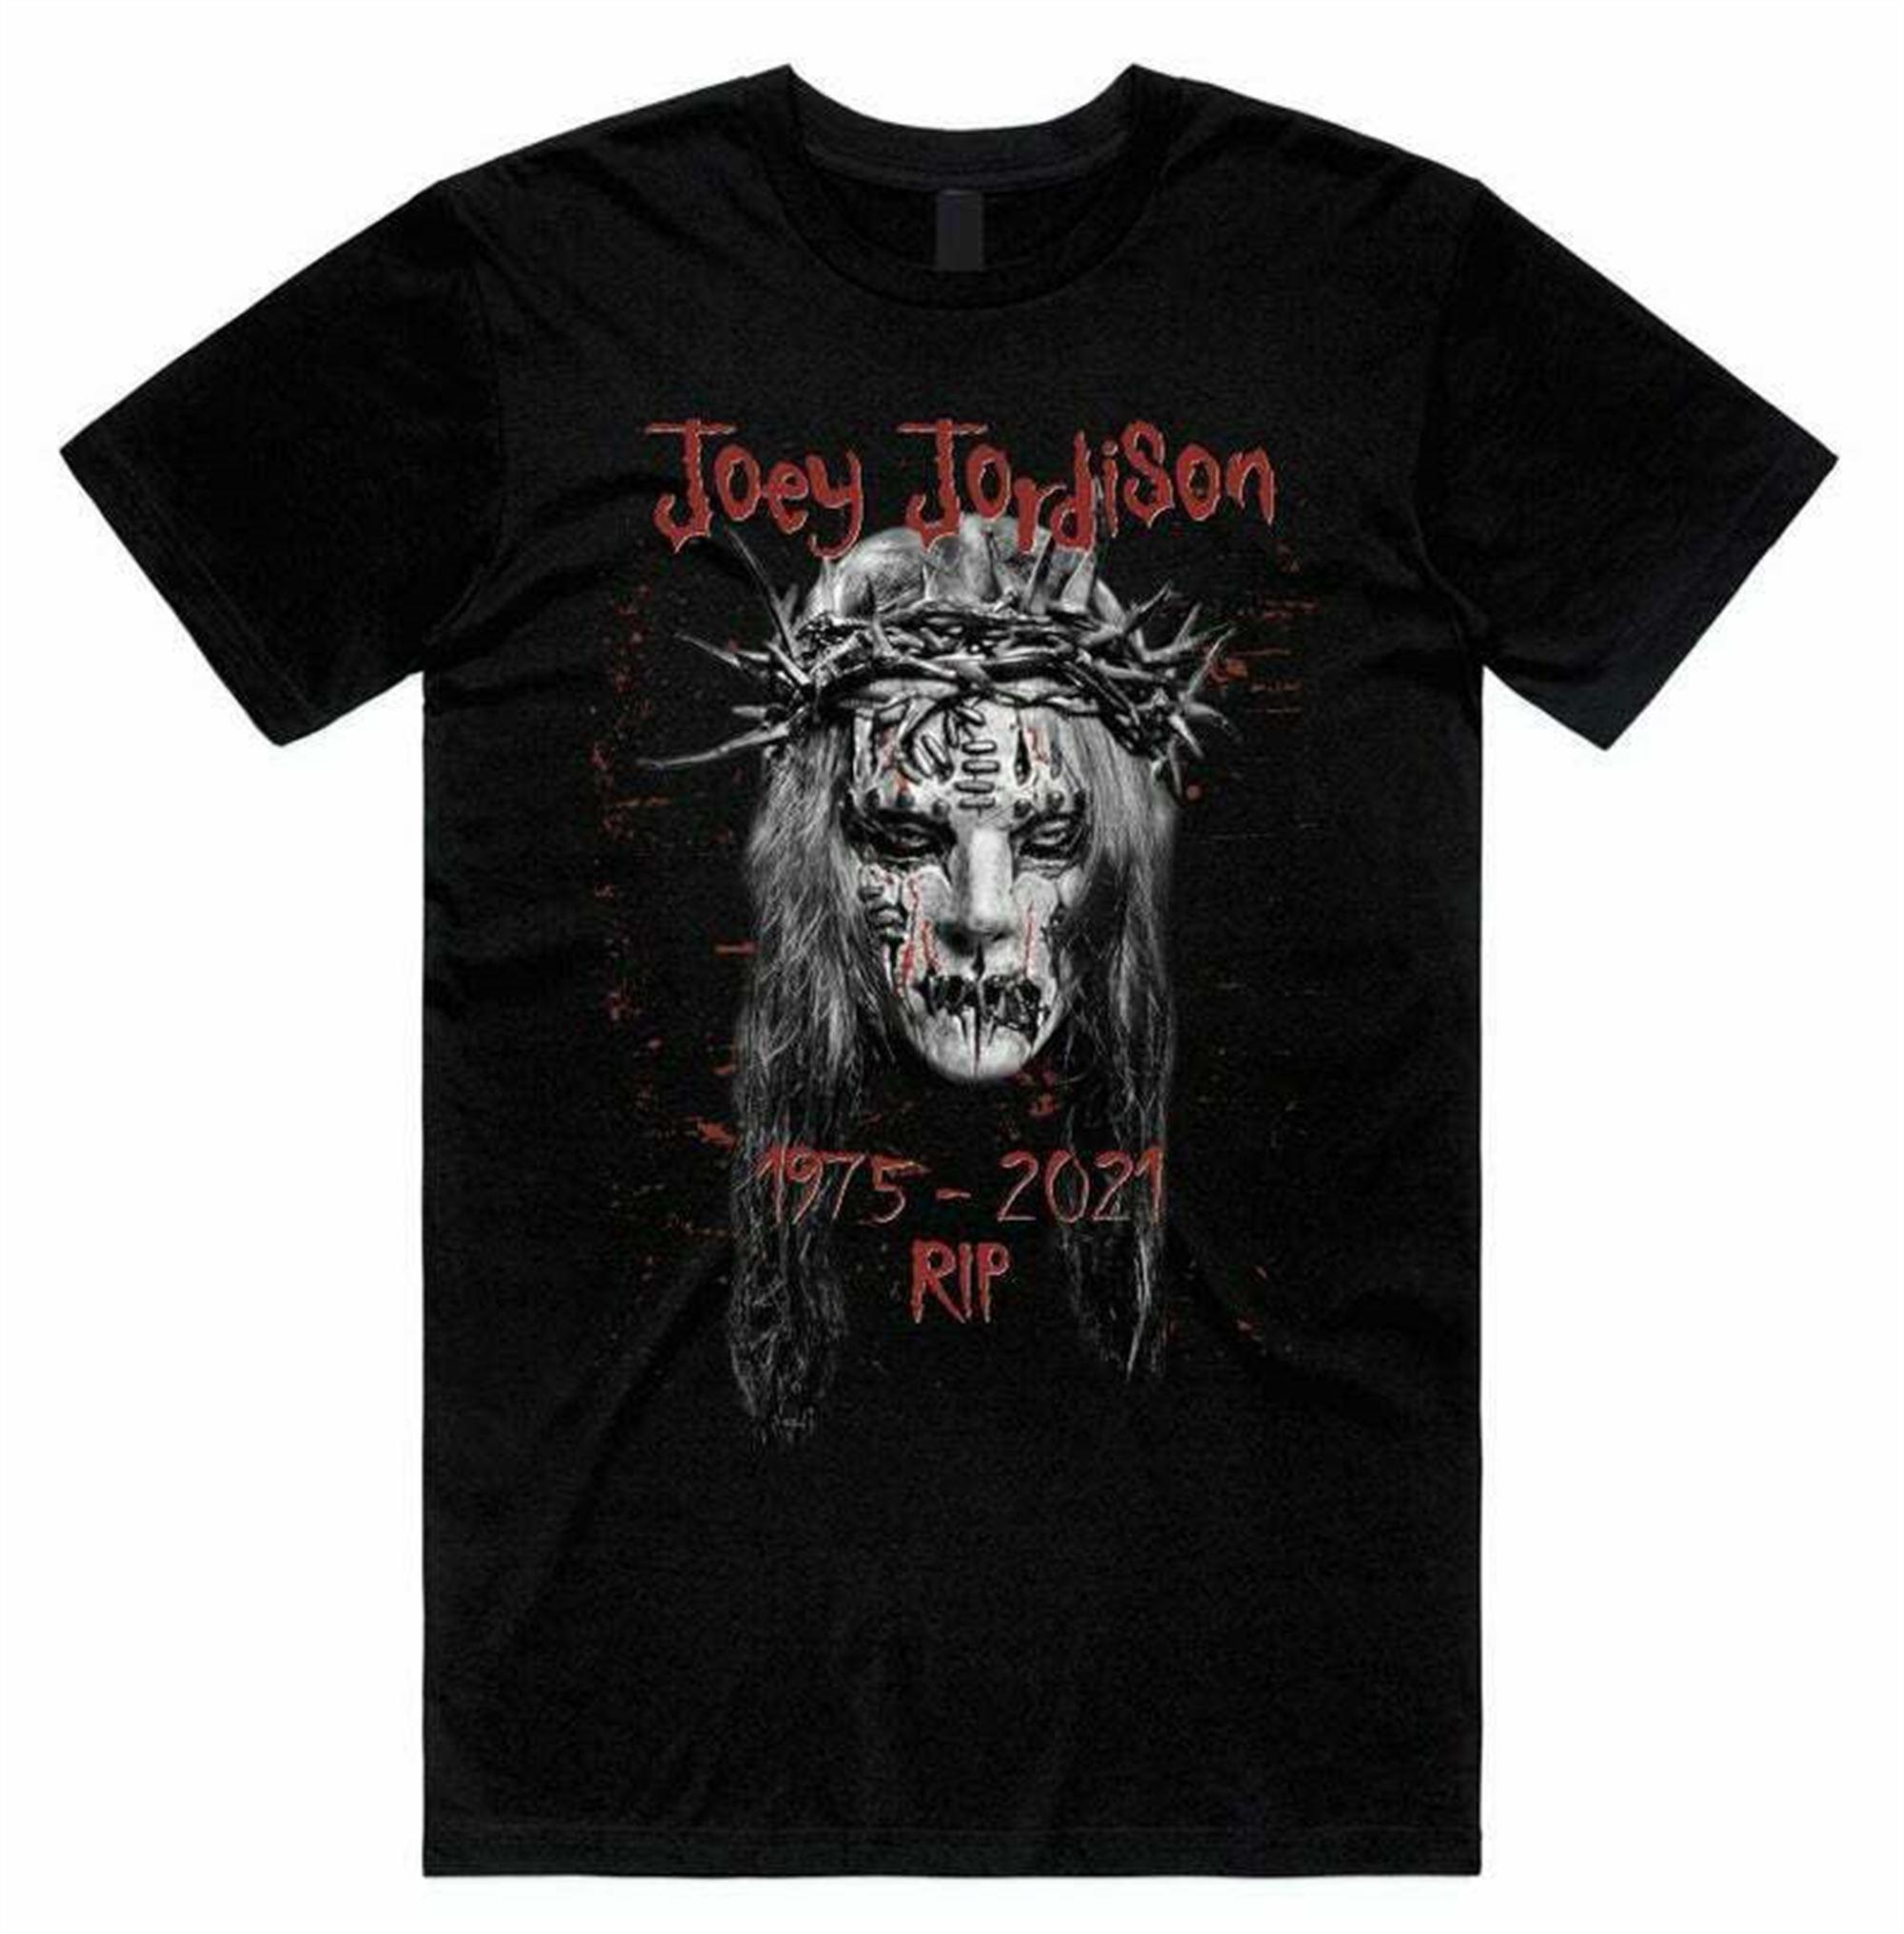 Rip Joey Jordison 5 T-shirt Cotton Size S-3xl